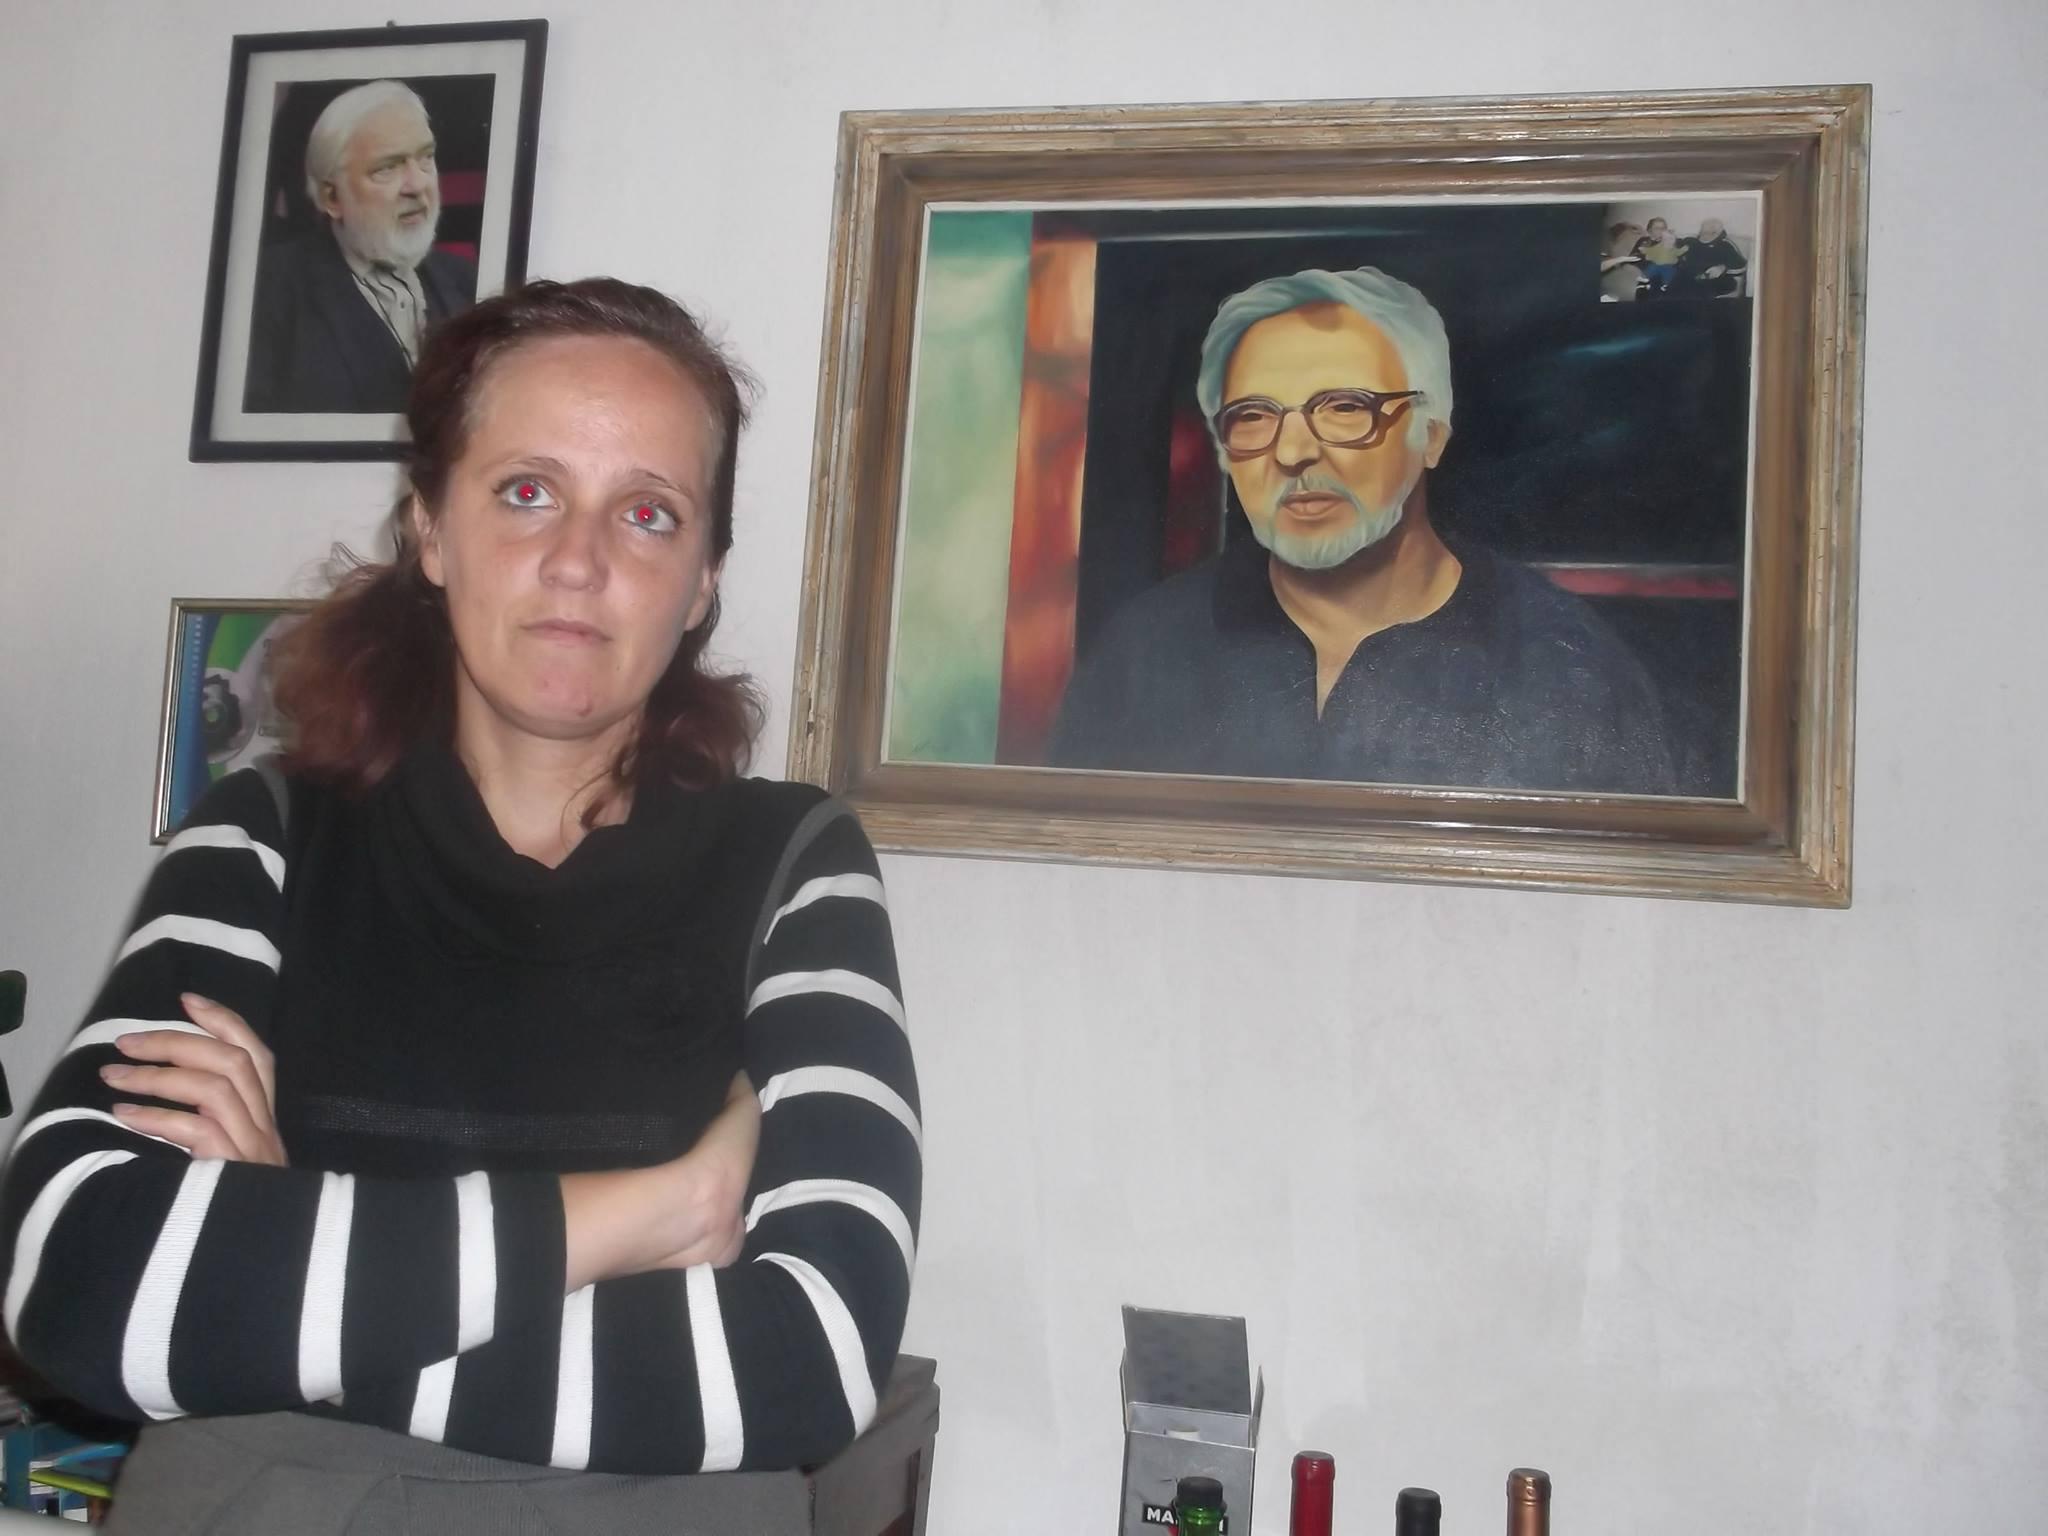 Anca Vladu spune ca a fost socata de cum a vorbit despre ea tatal sau adoptiv